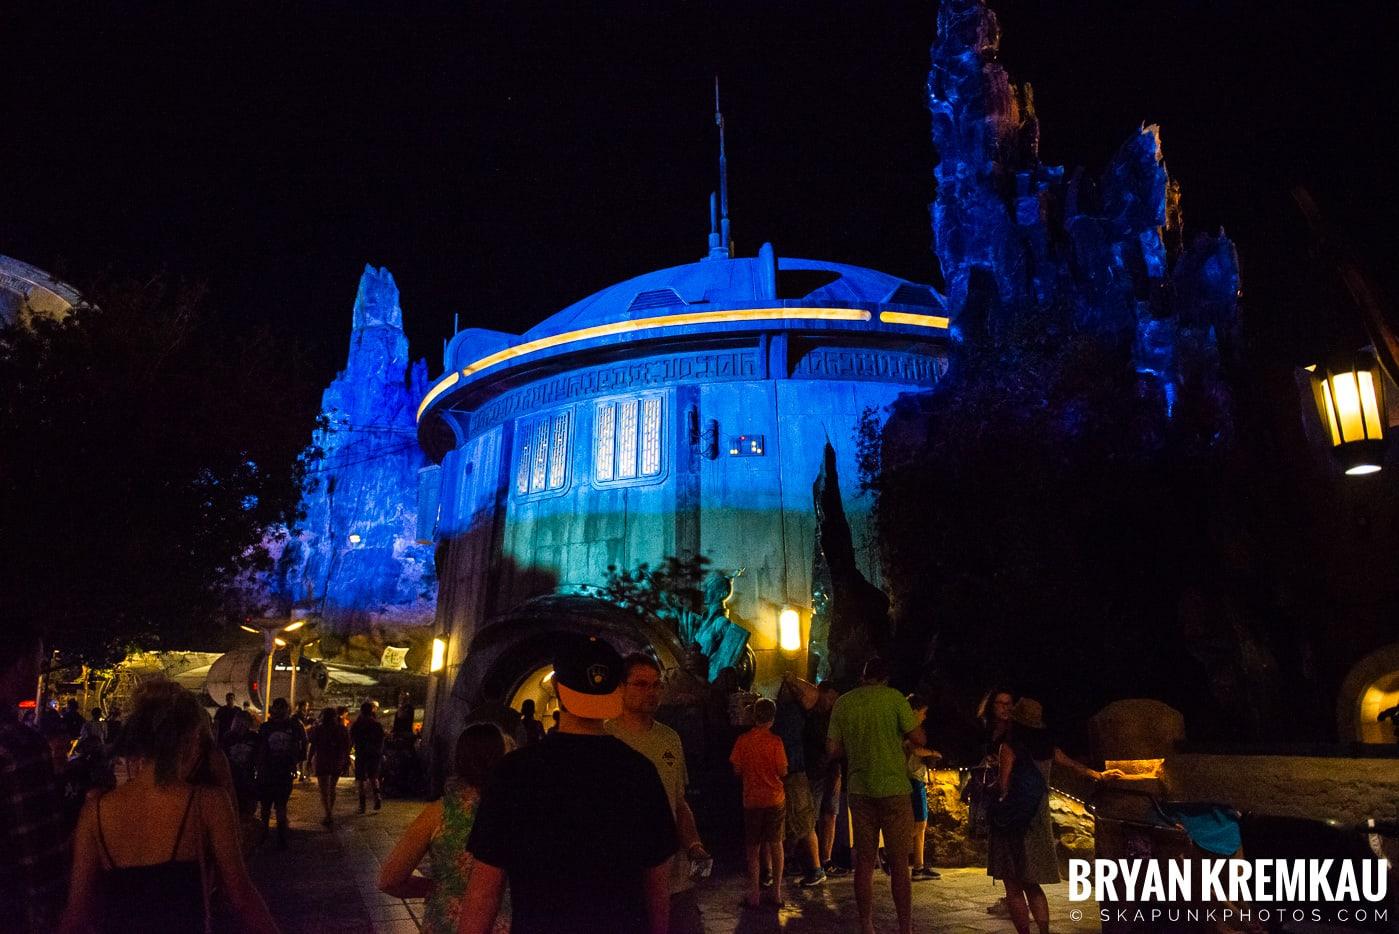 Walt Disney World Vacation: Day 5 (Animal Kingdom / Disney's Hollywood Studios) - 10.3.19 (30)